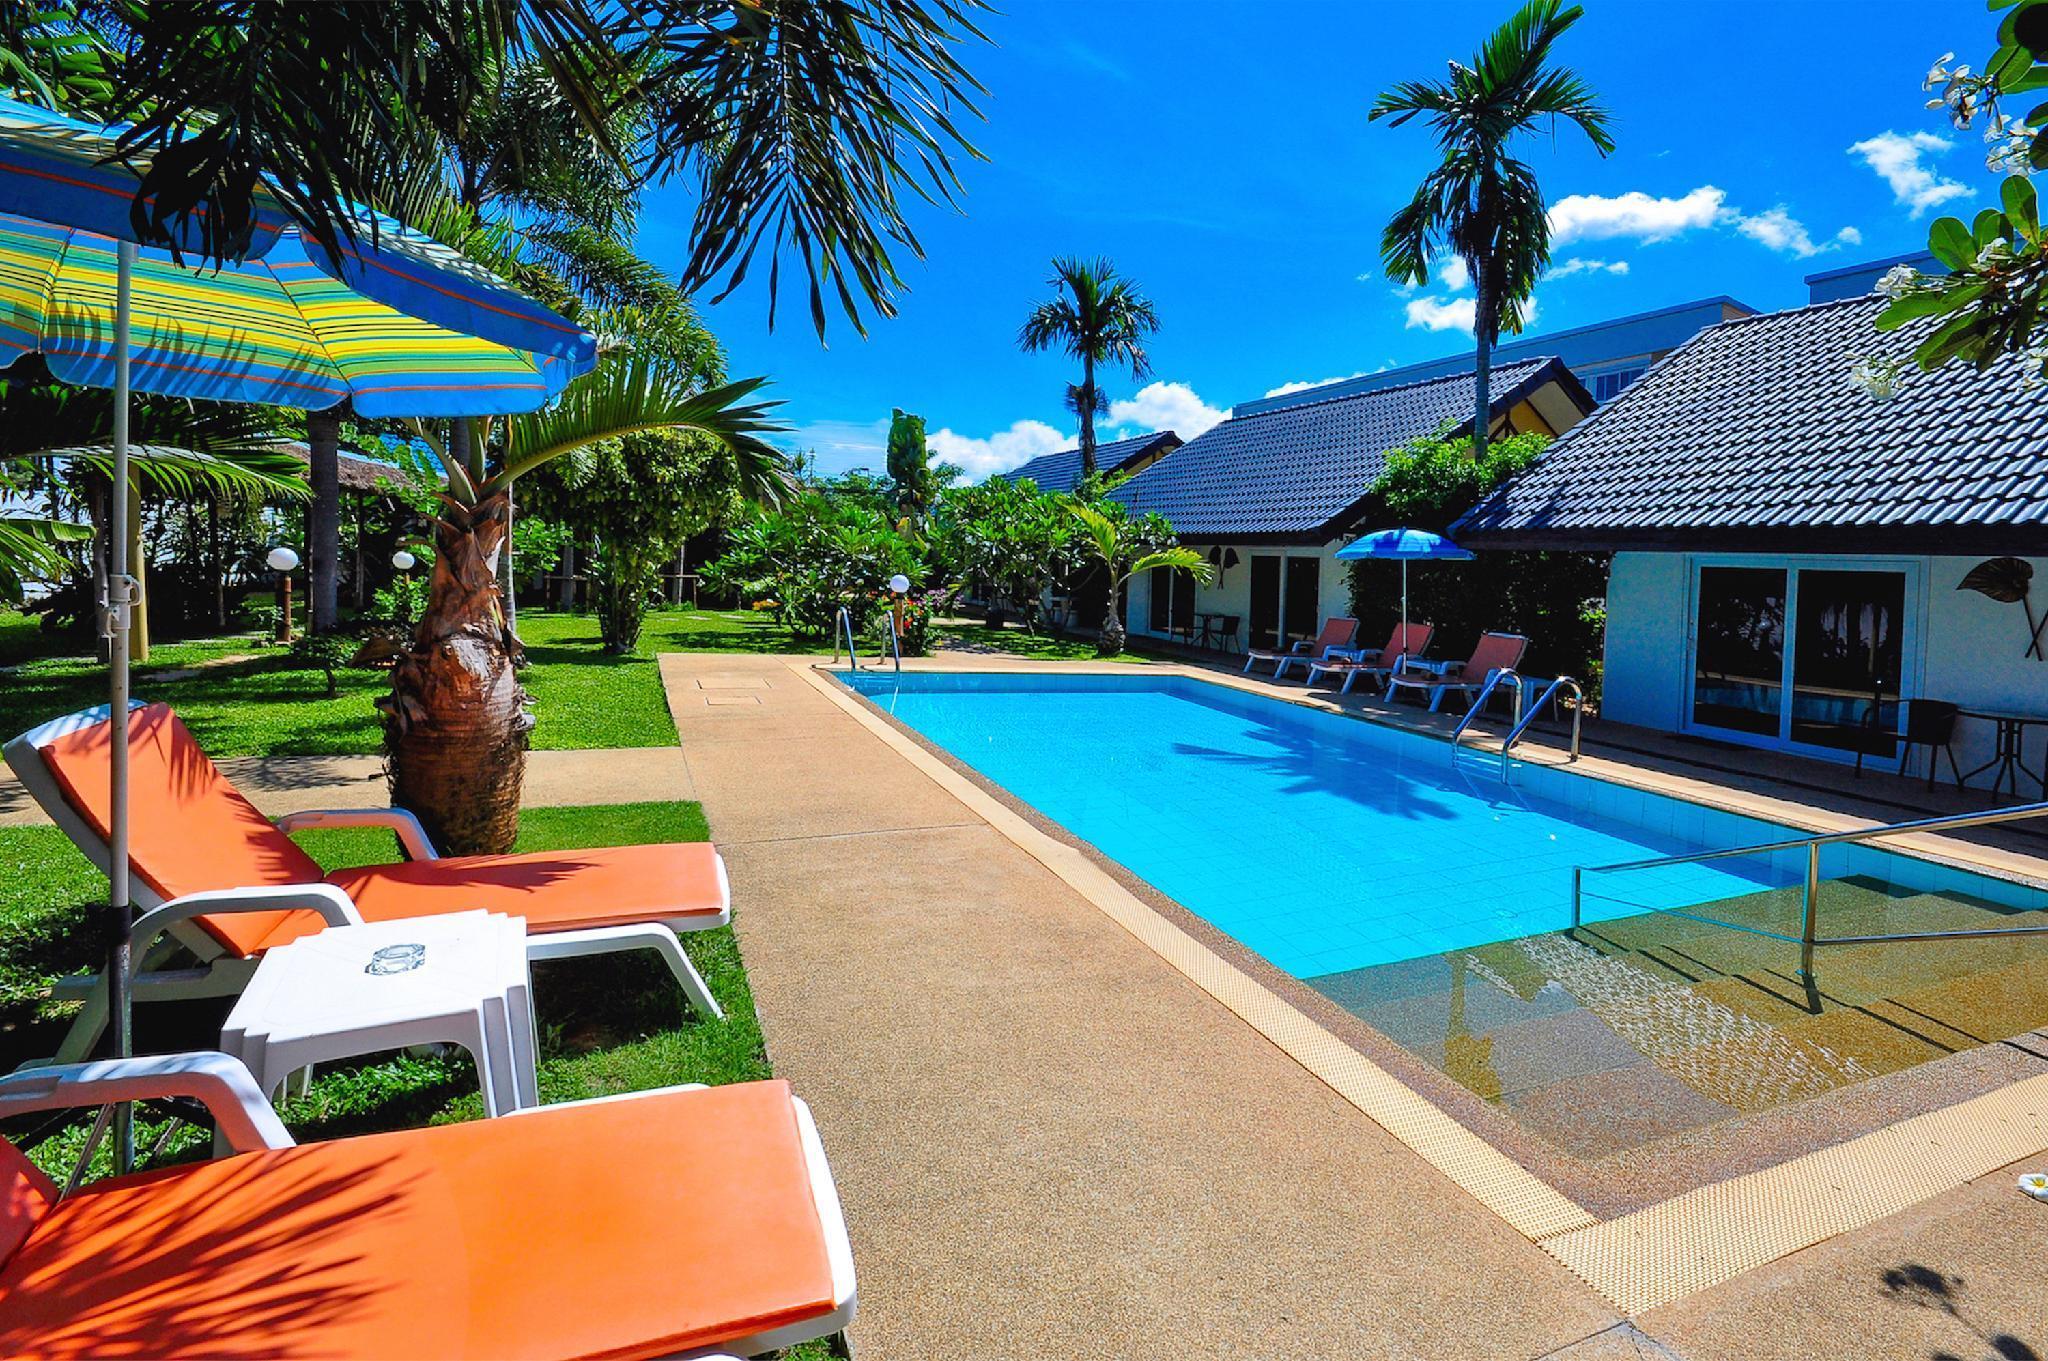 Phuket Airport Hotel โรงแรมภูเก็ต แอร์พอร์ต